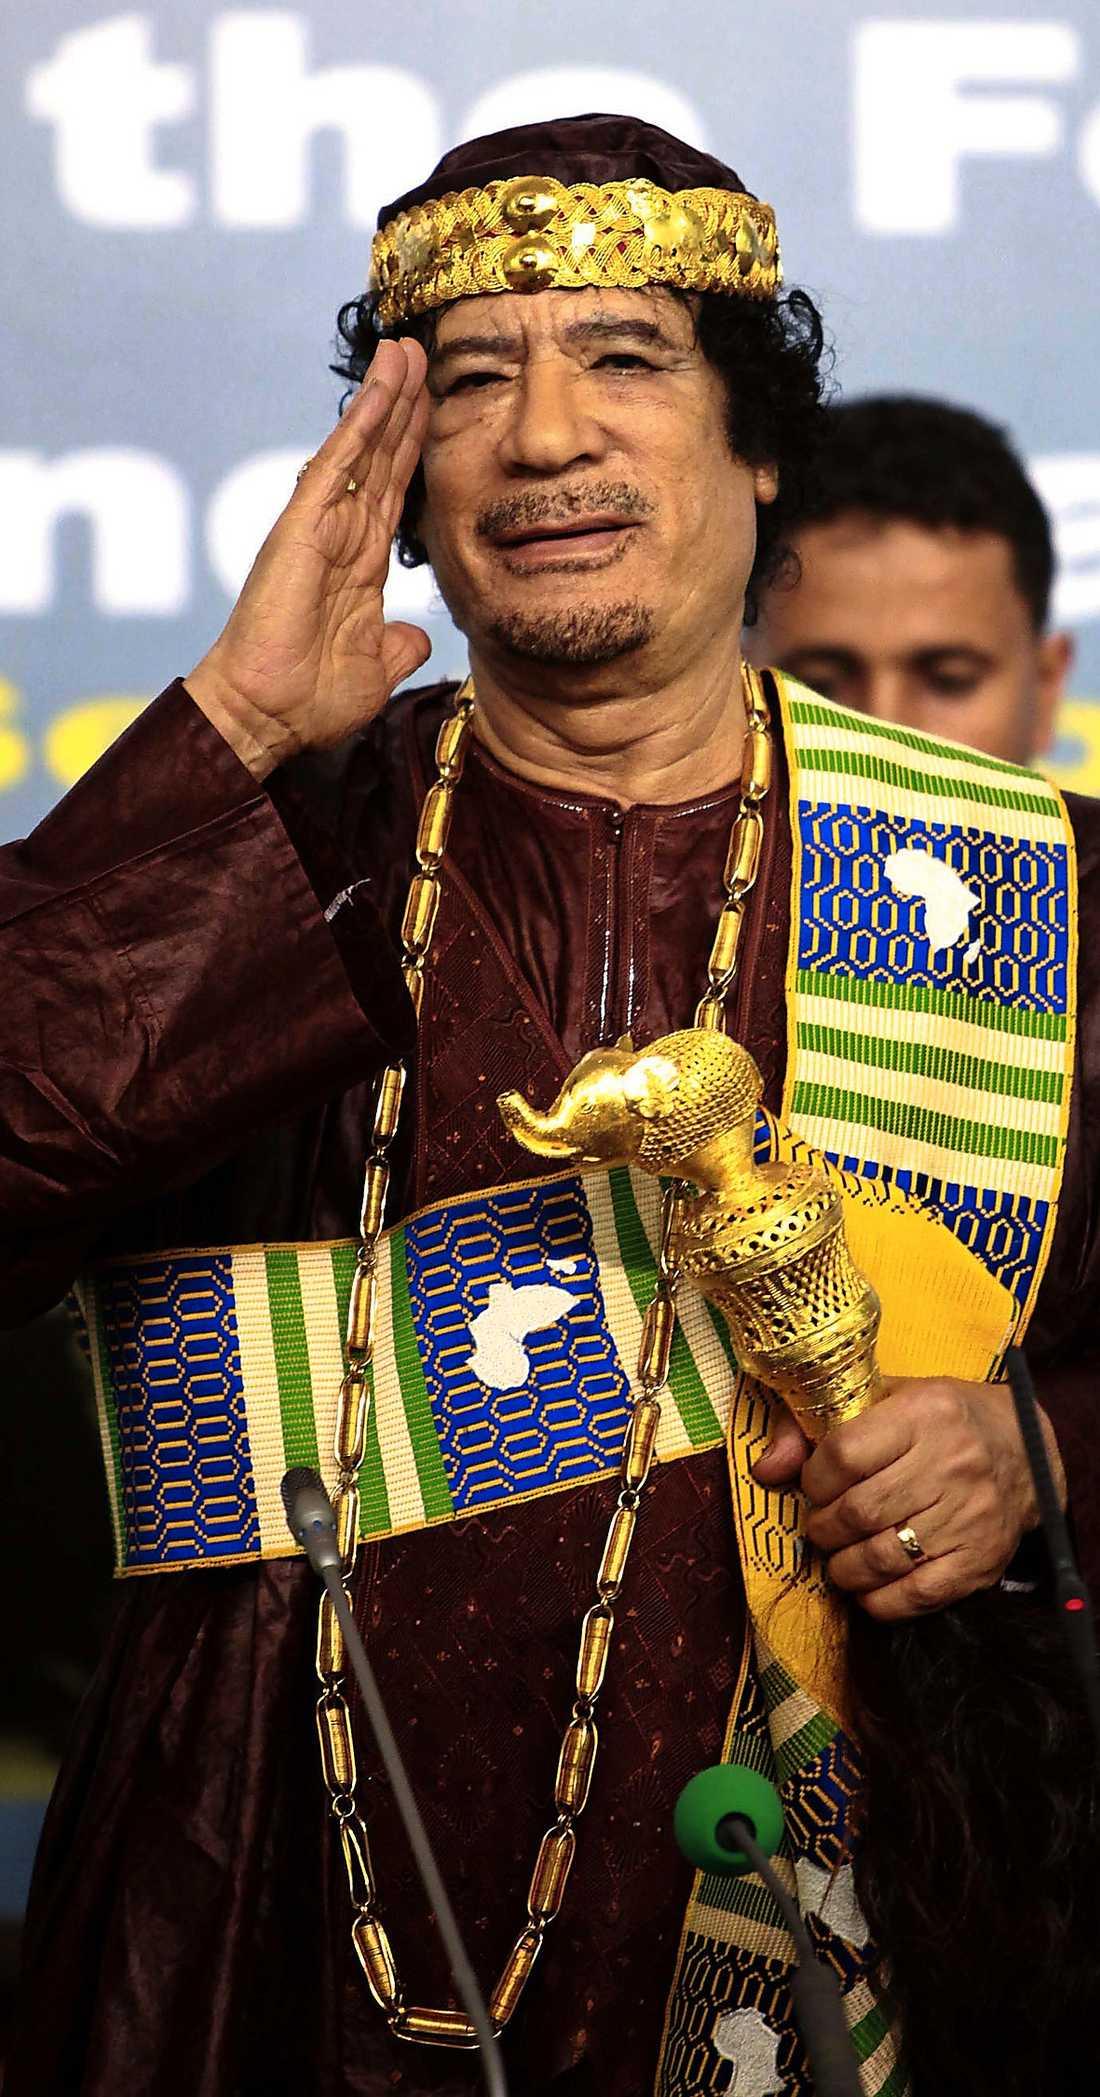 himmel Gaddafis fall.